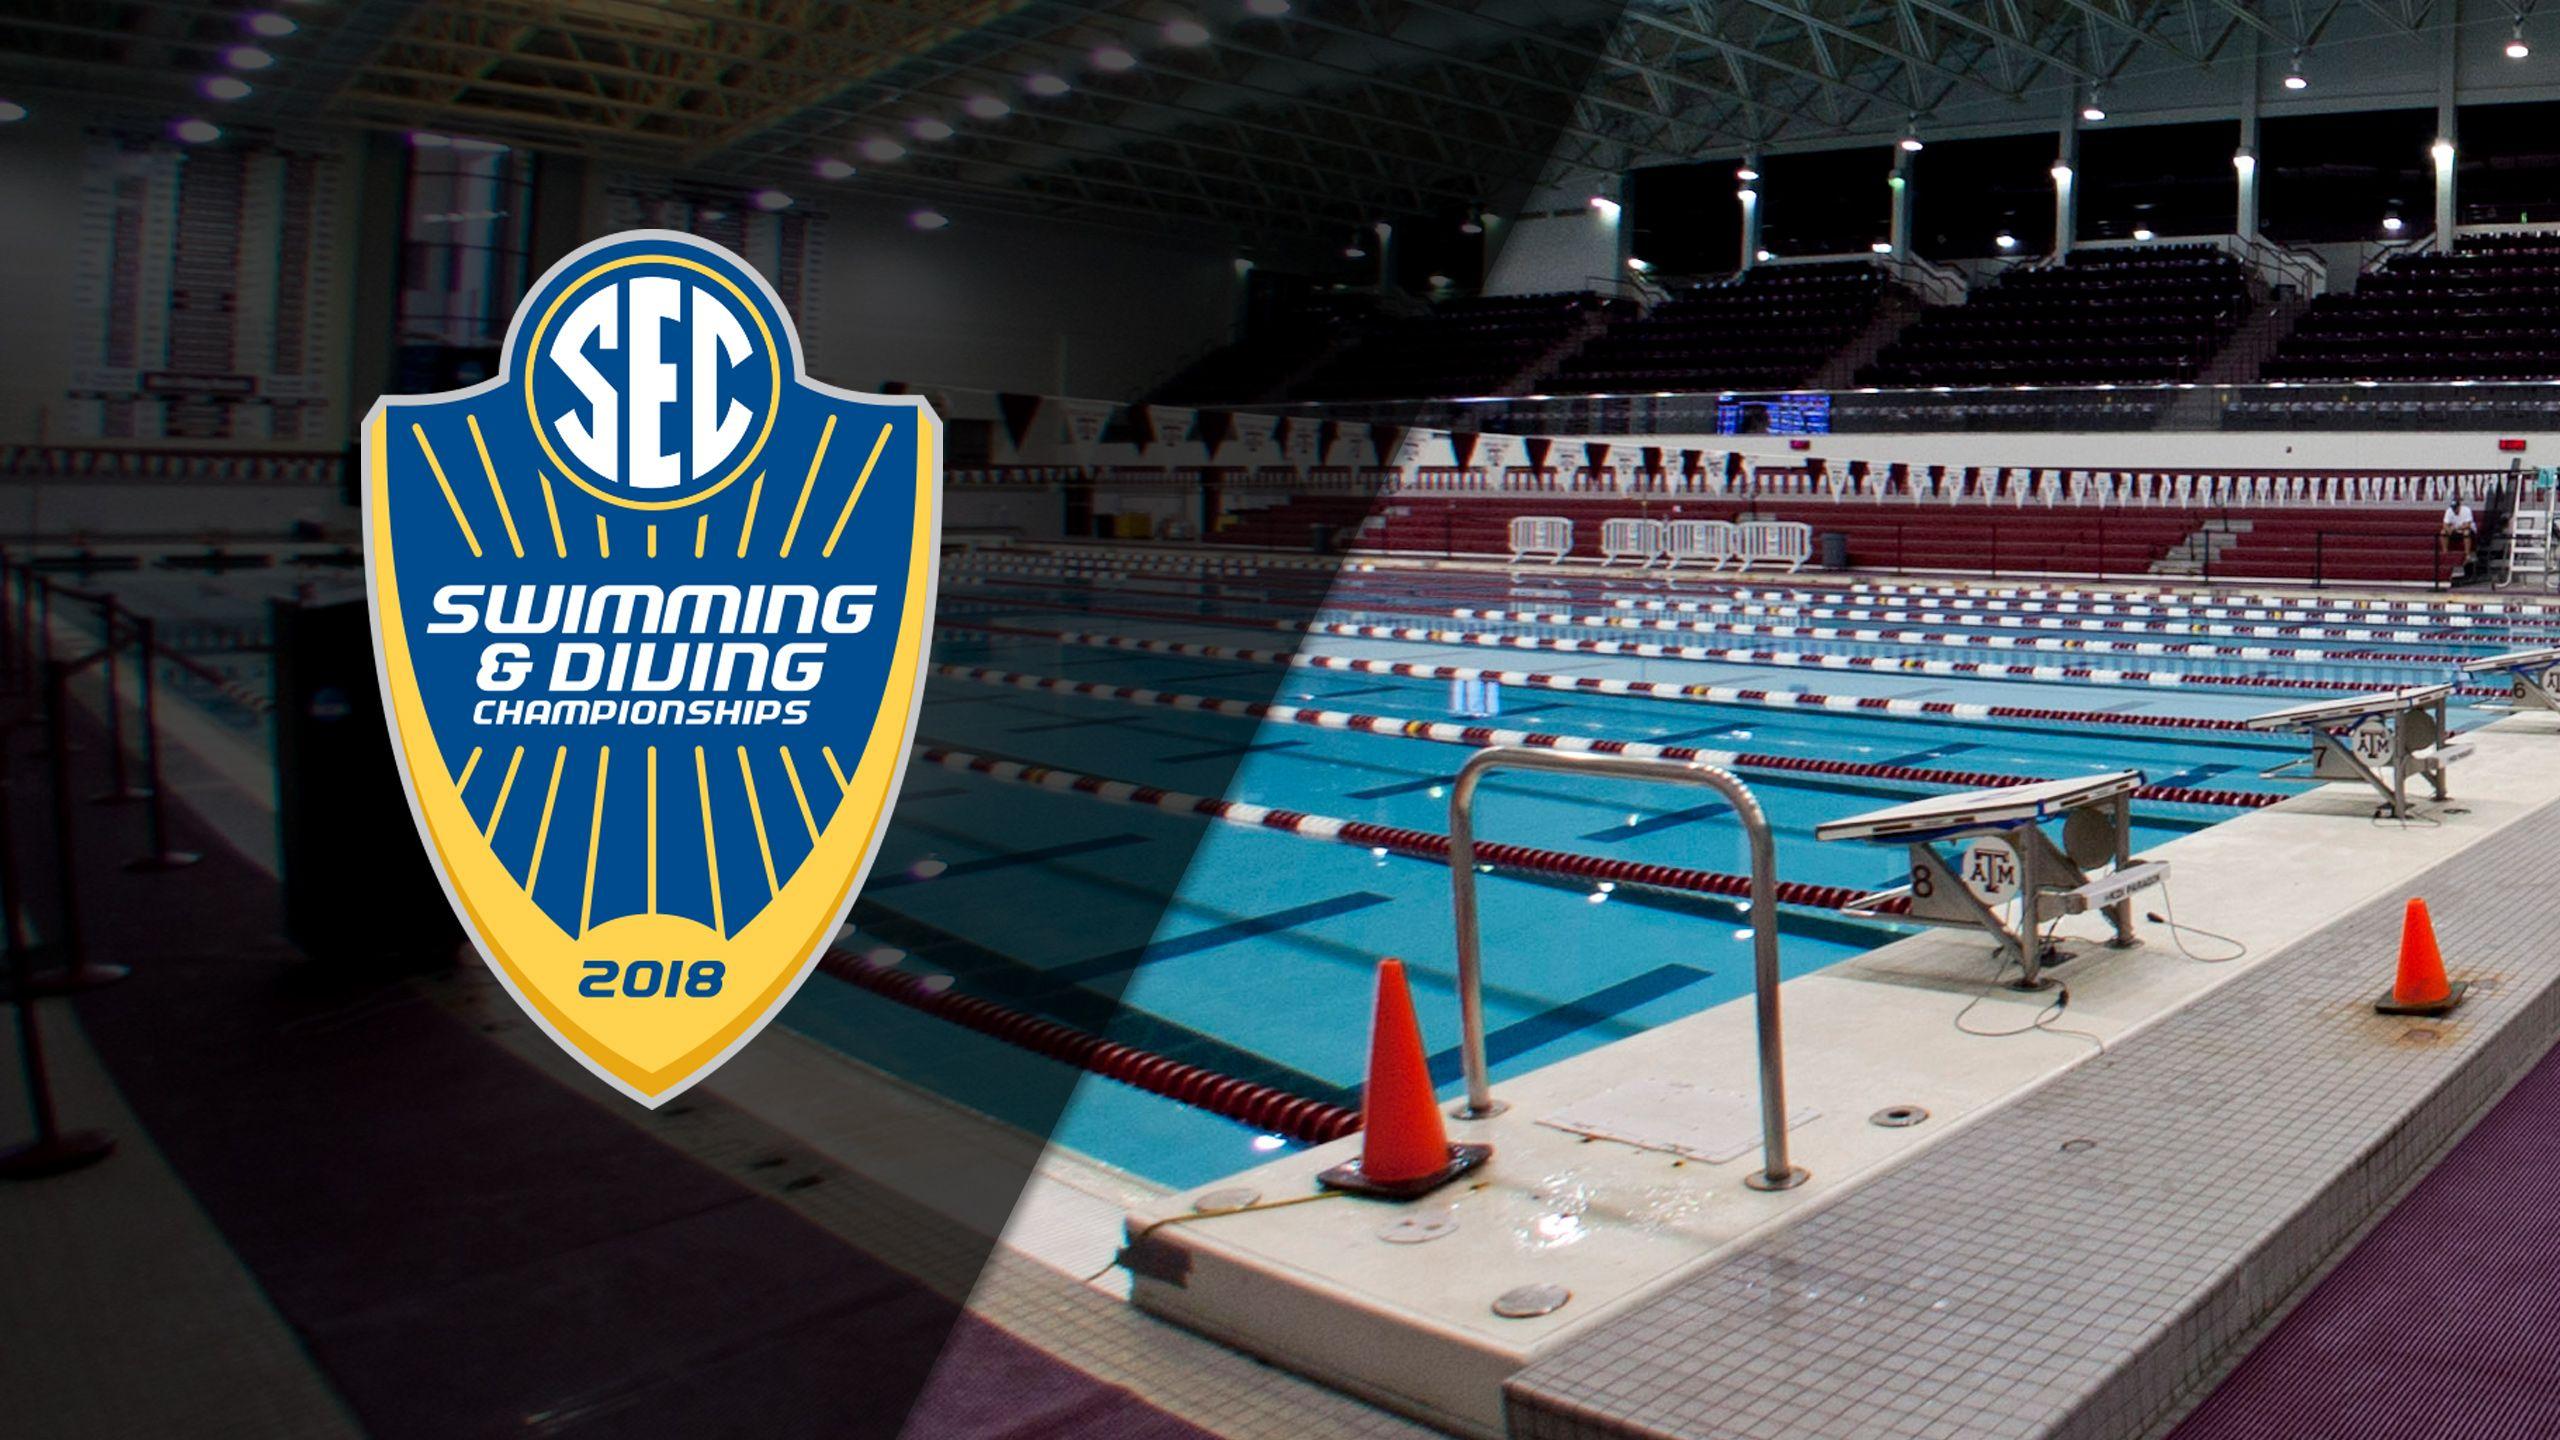 2018 SEC Swimming & Diving Championship